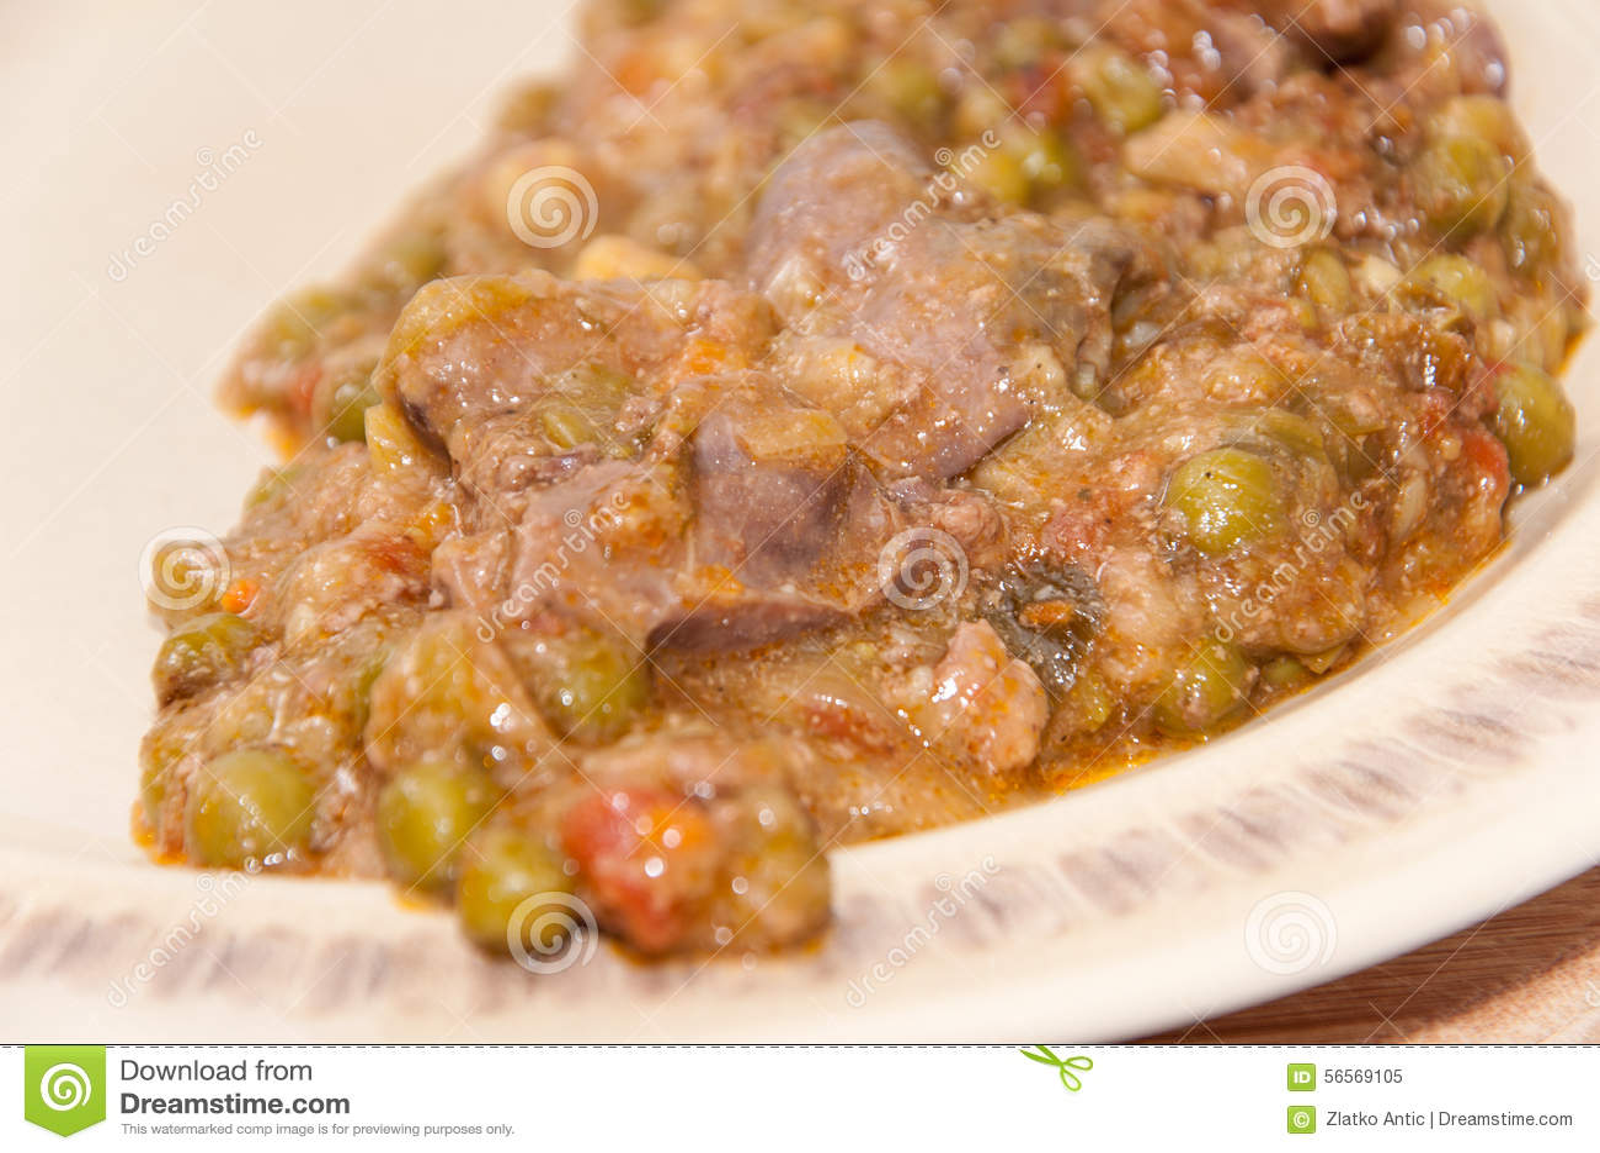 Download Μαγειρευμένα πράσινα μπιζέλια και συκώτι κοτόπουλου Στοκ Εικόνα - εικόνα από συκώτι, εστιατόριο: 56569105